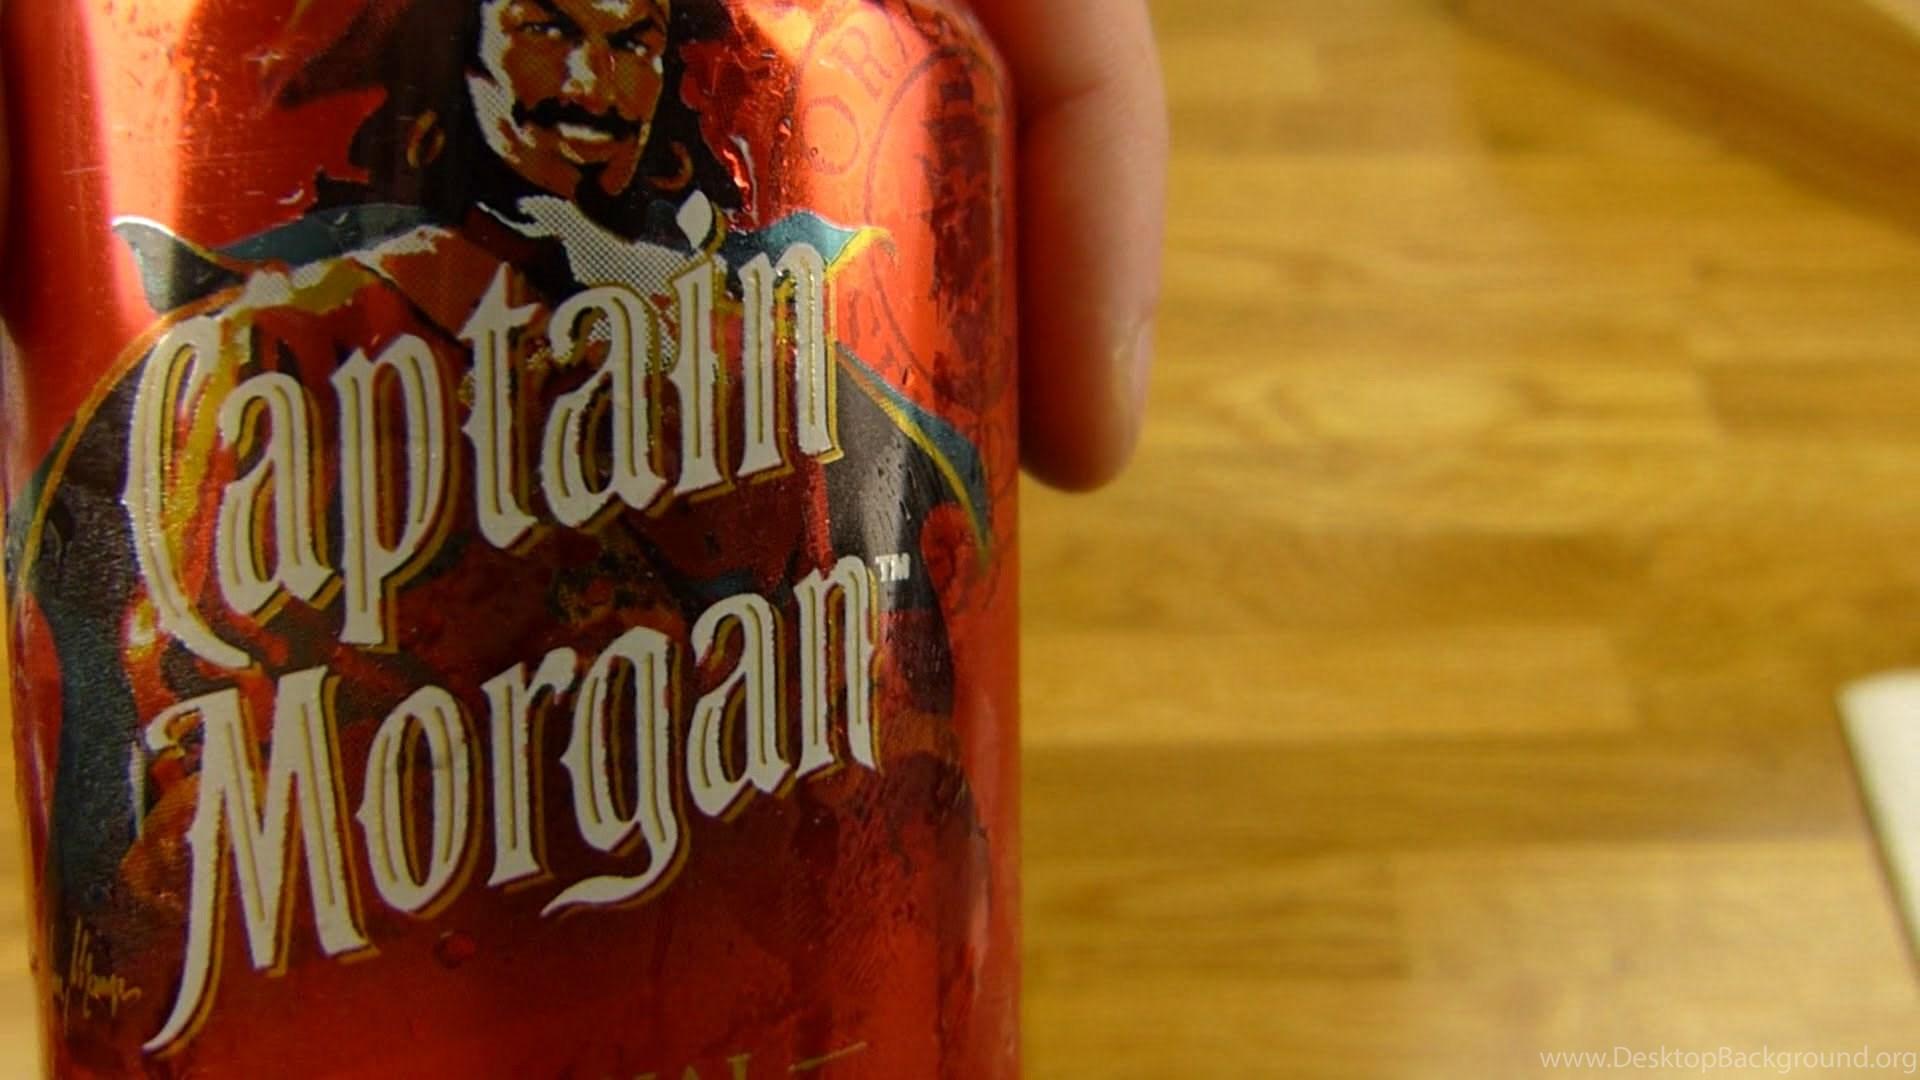 Captain Morgan Rum Cola Youtube Desktop Background